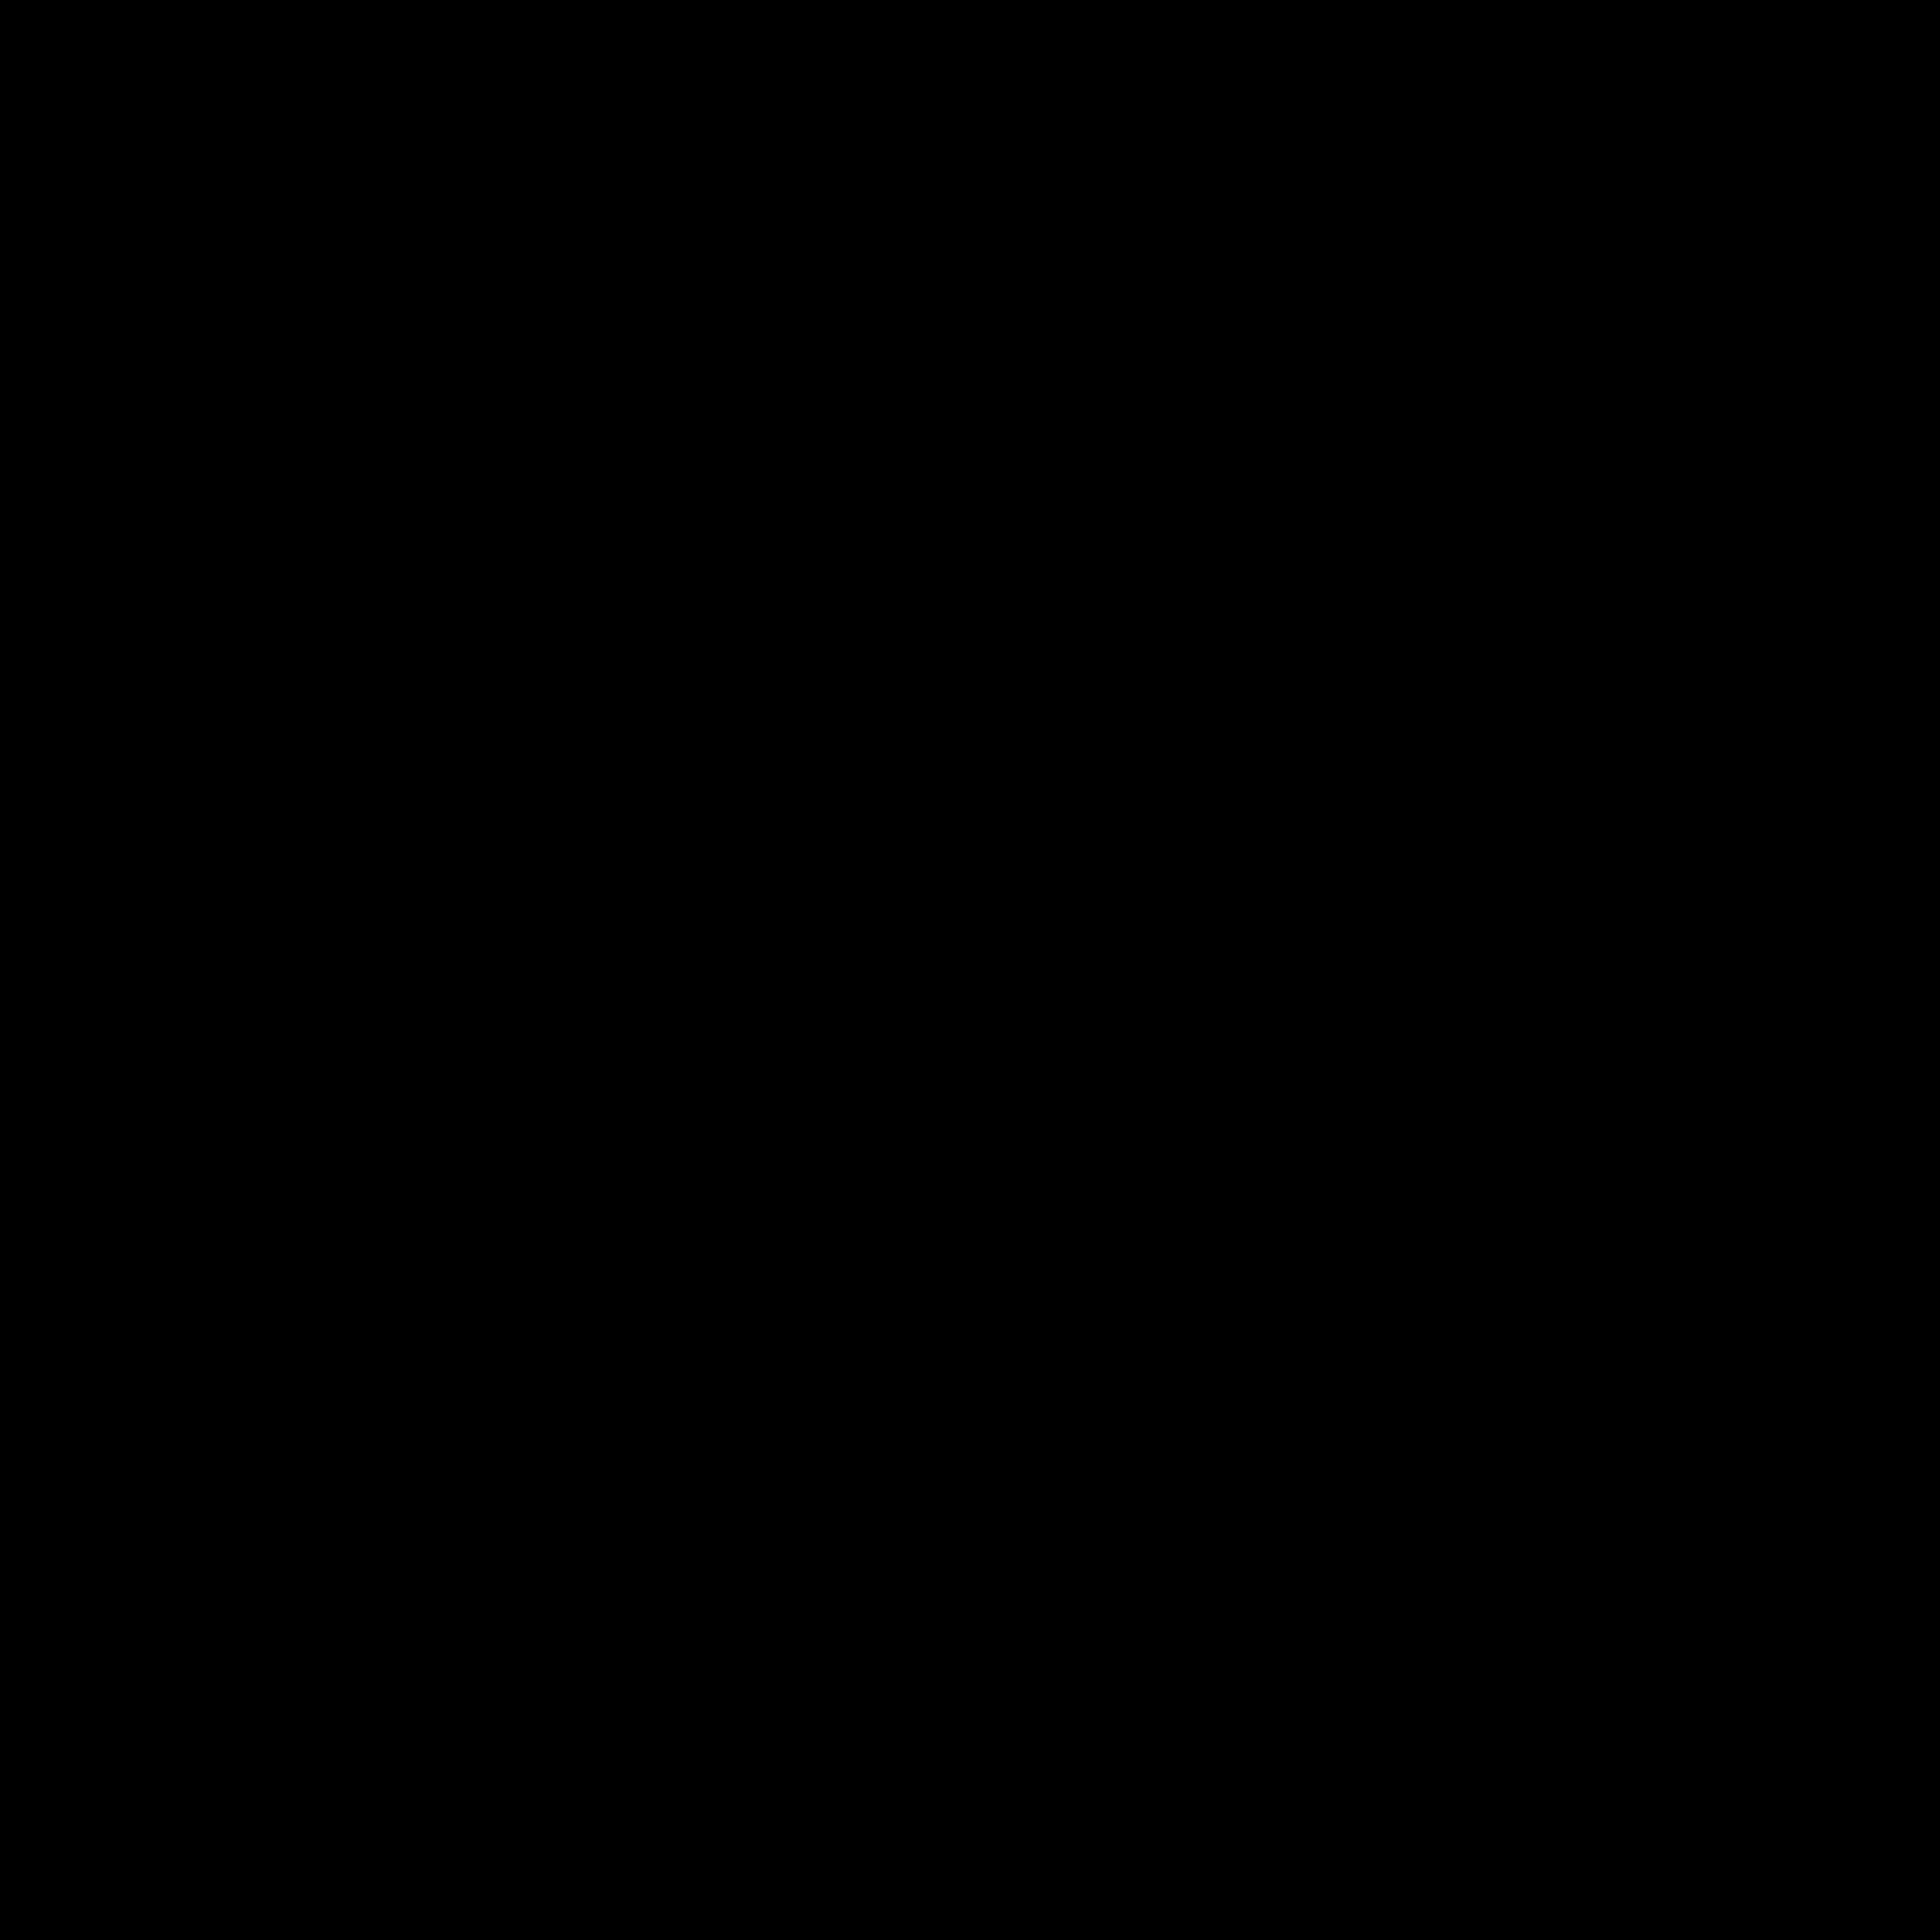 All HPS Logos-04.png